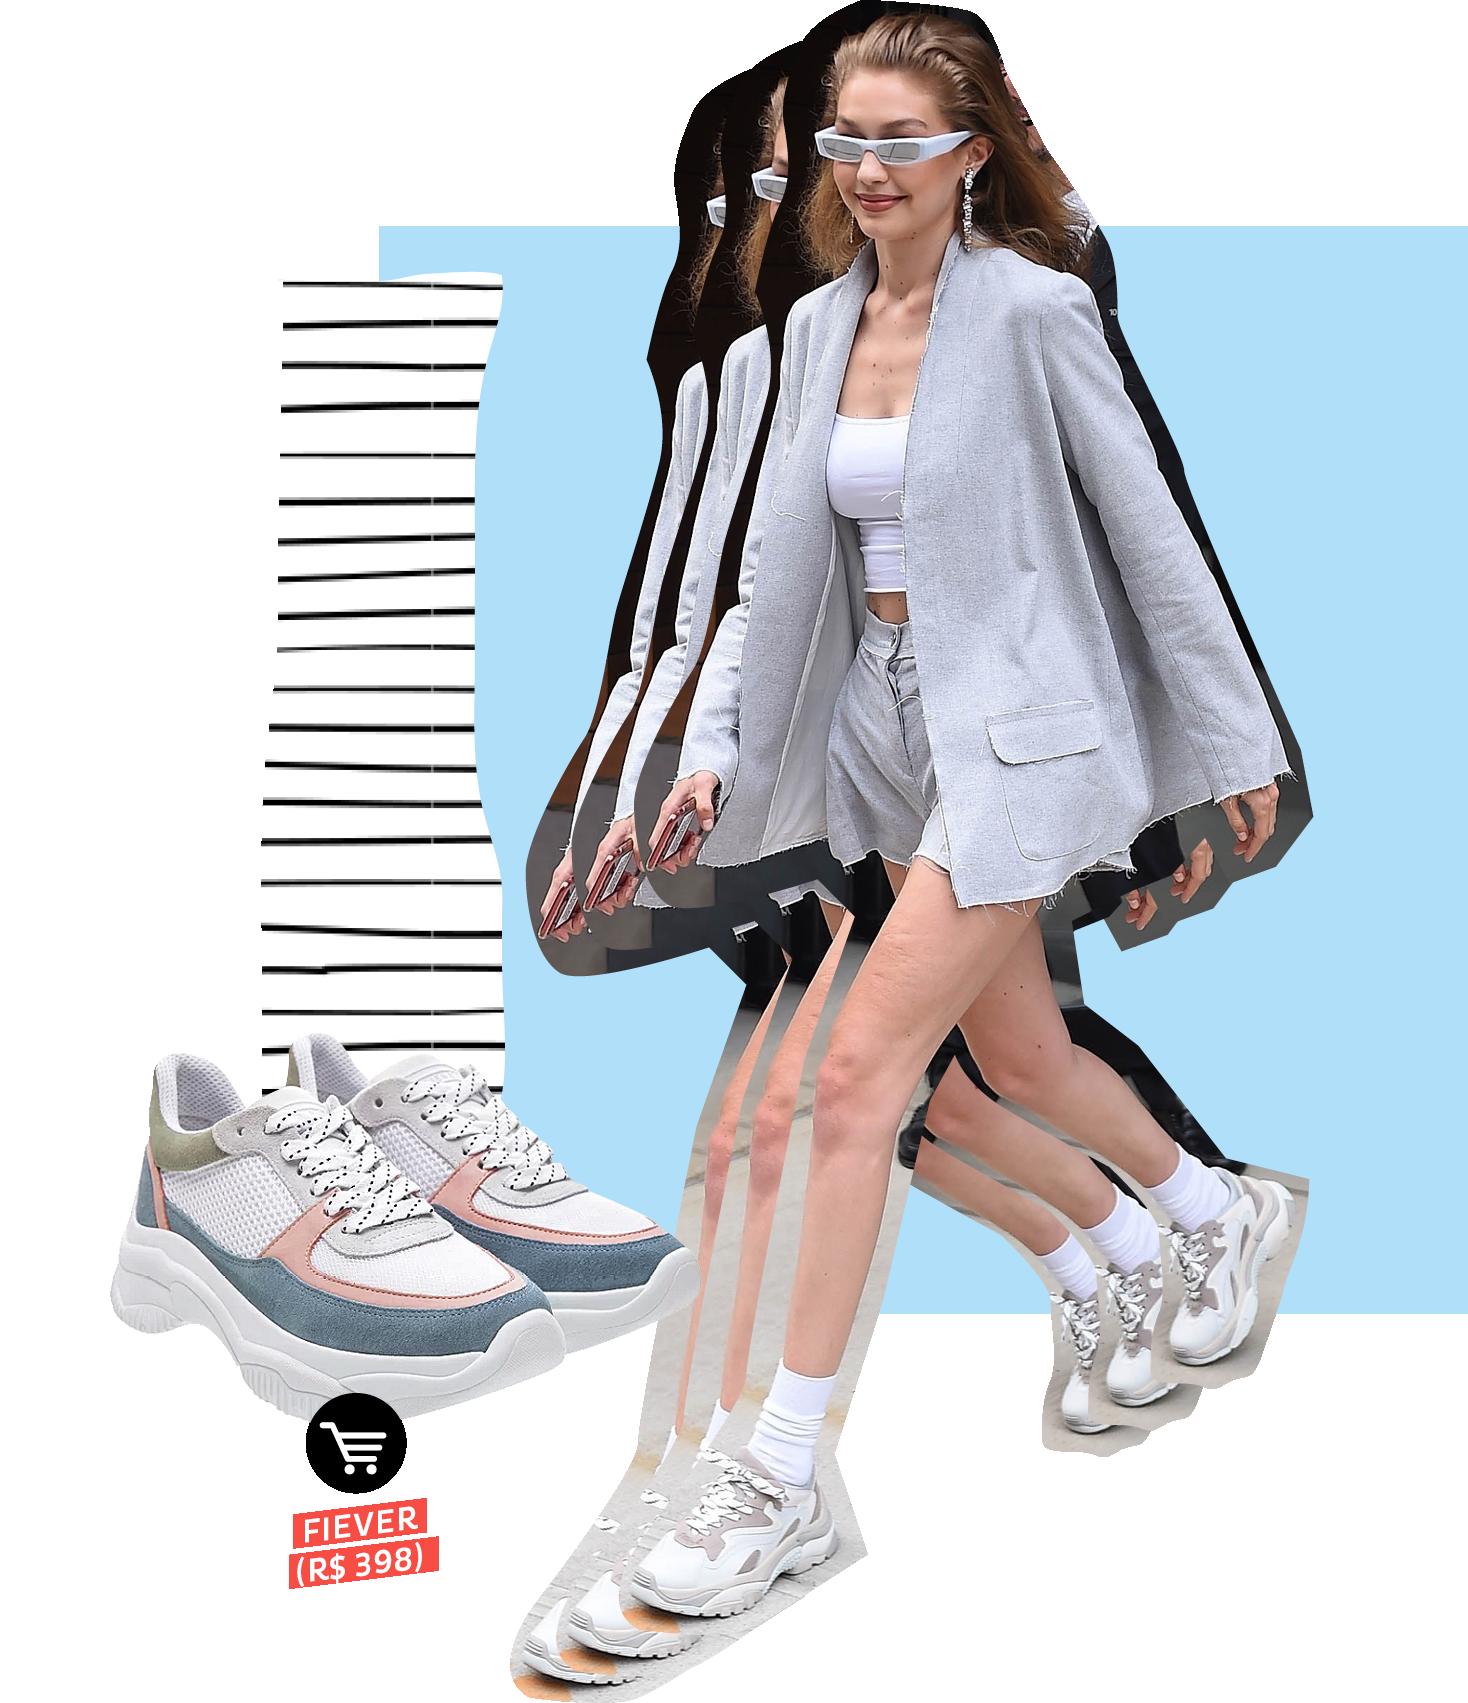 Gigi Hadid usando dad sneakers no street style. Dicas de como usar e onde comprar